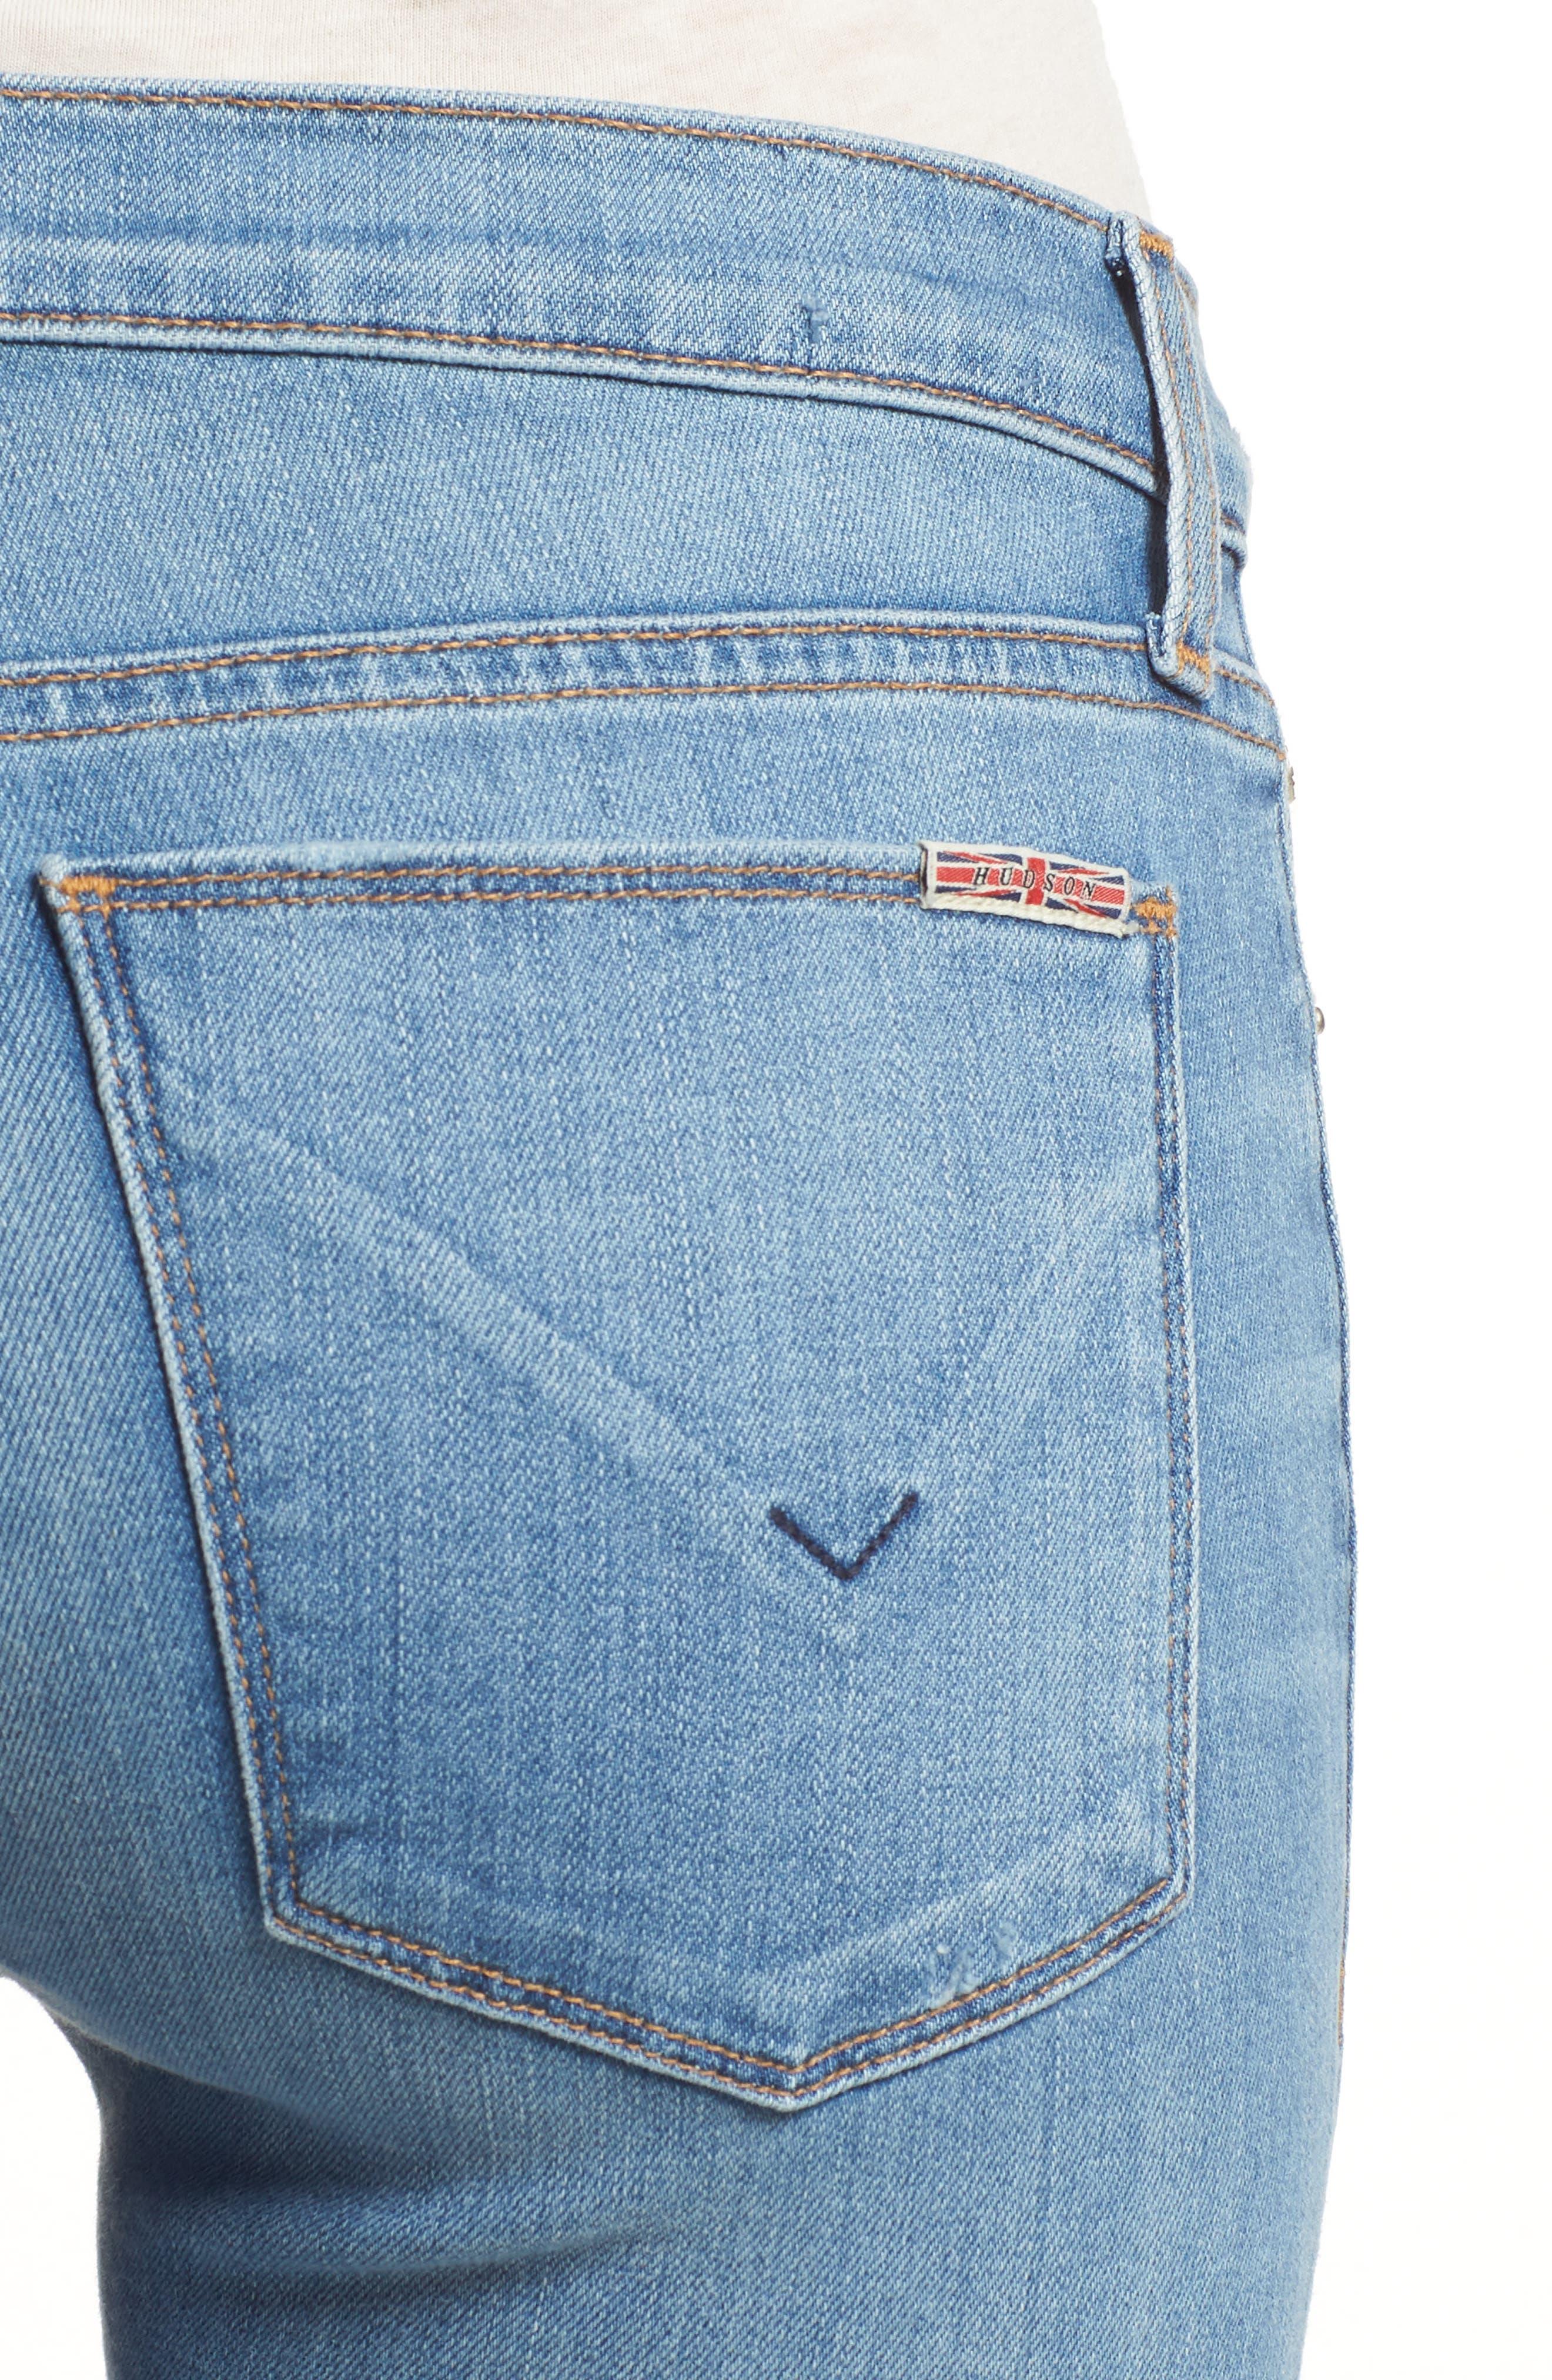 Krista Ankle Super Skinny Jeans,                             Alternate thumbnail 4, color,                             No Tears